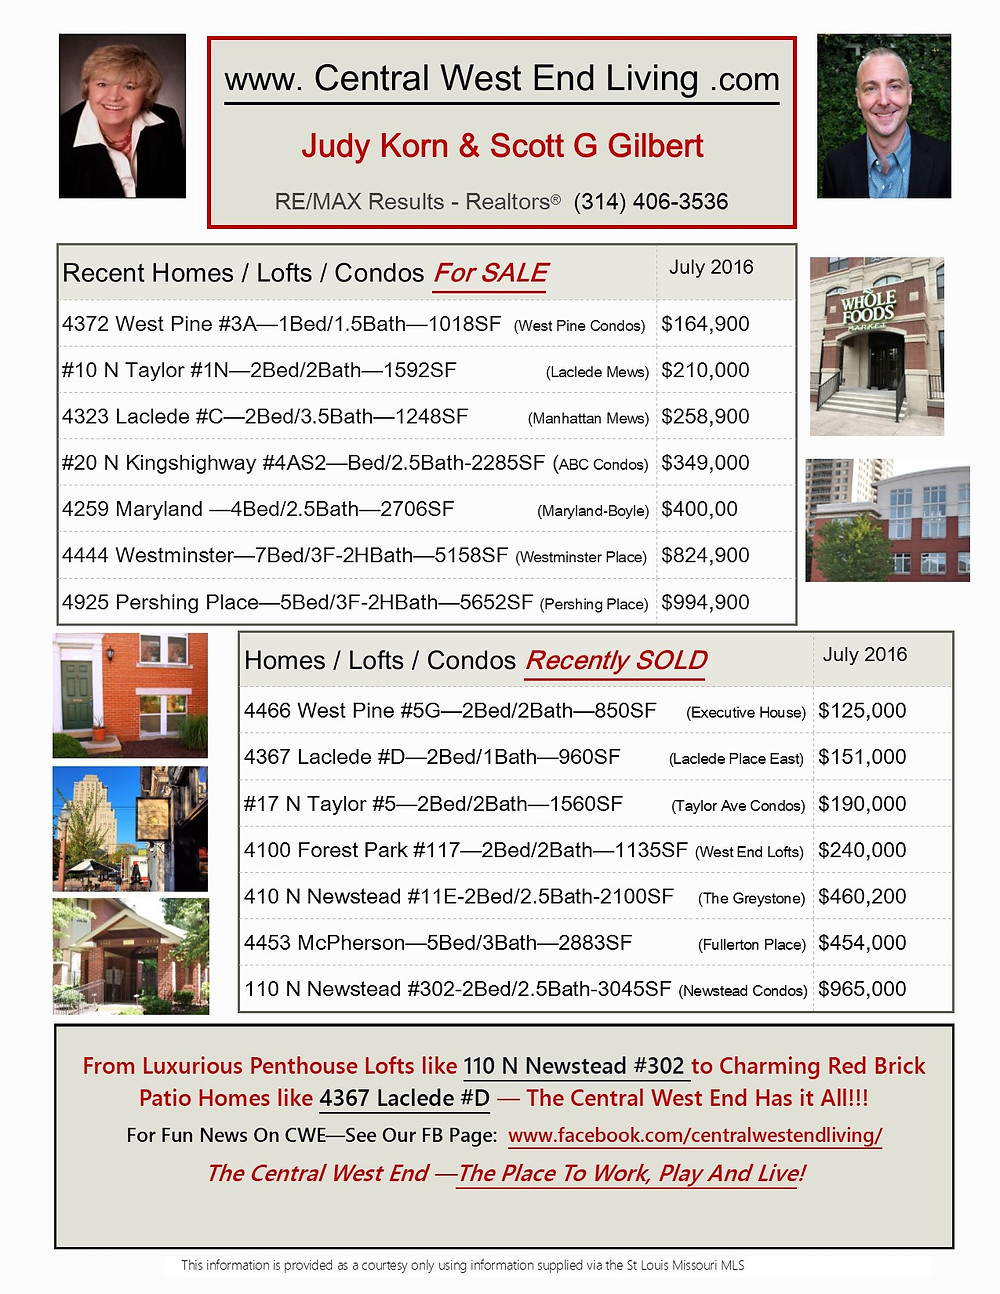 Central West End Real Estate Market Watch July 2016, Scott G Gilbert,Realtor